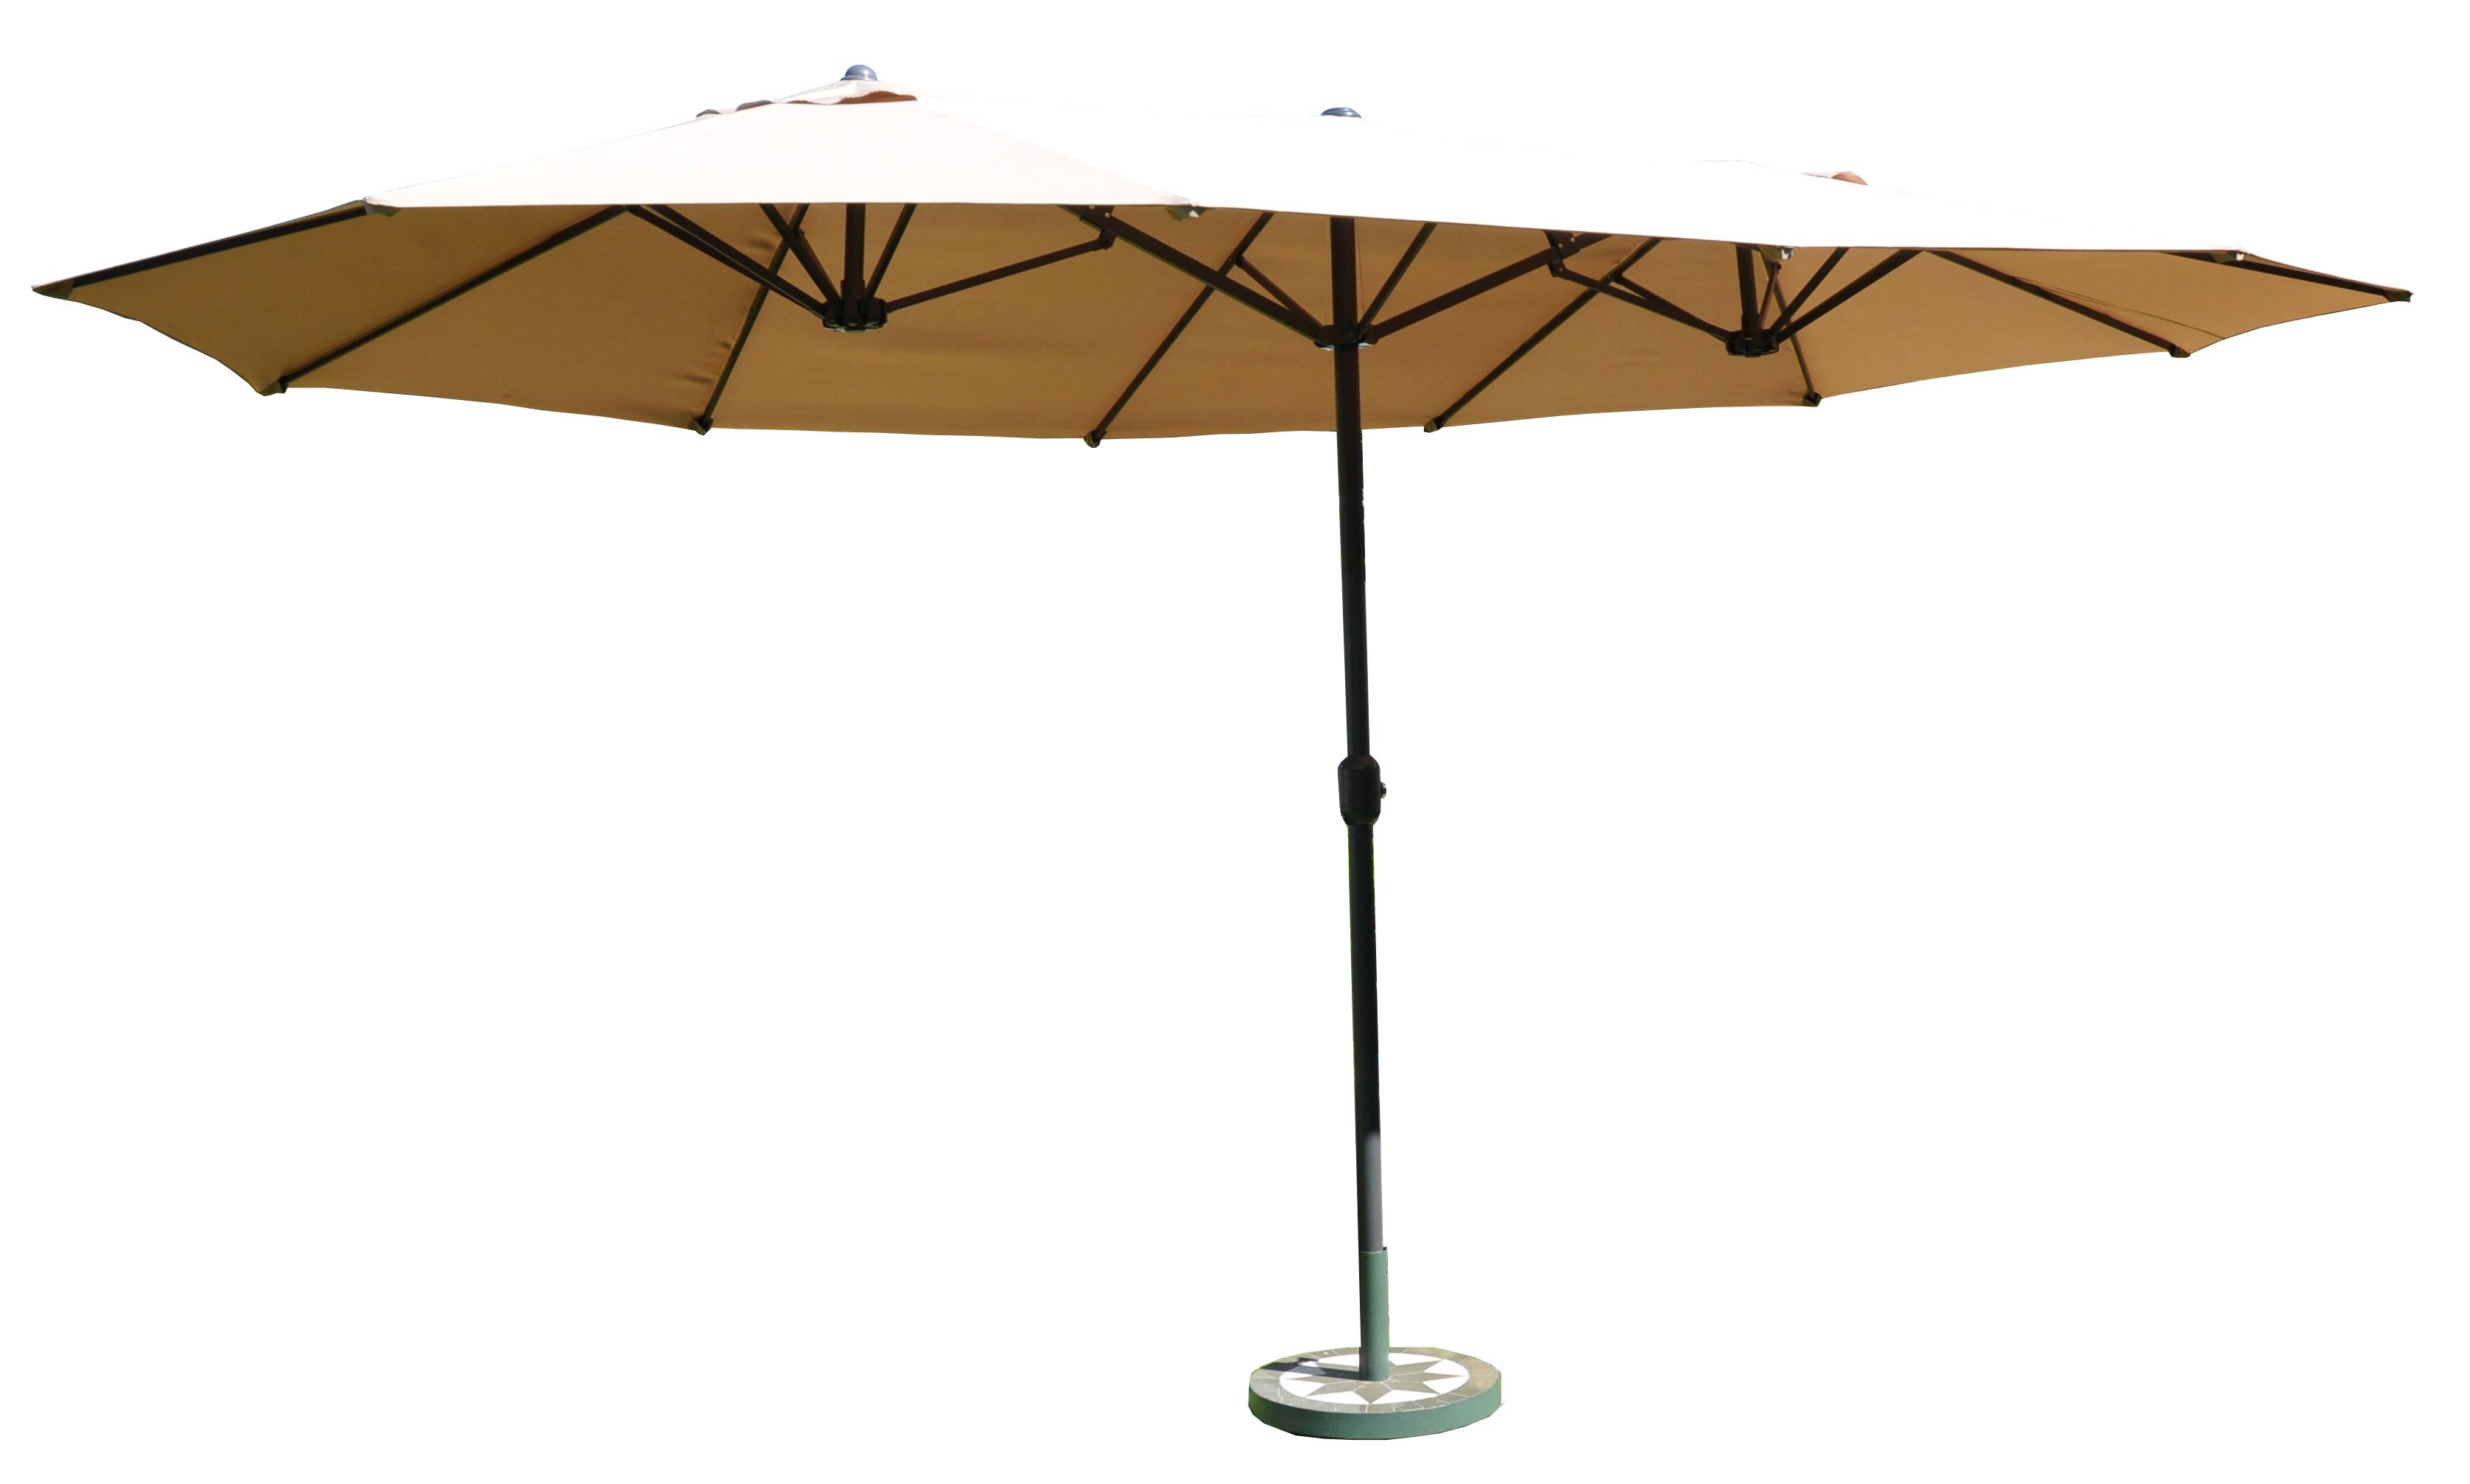 leco sonnenschirm versch farben oval sonnenschutz gartenschirm ebay. Black Bedroom Furniture Sets. Home Design Ideas